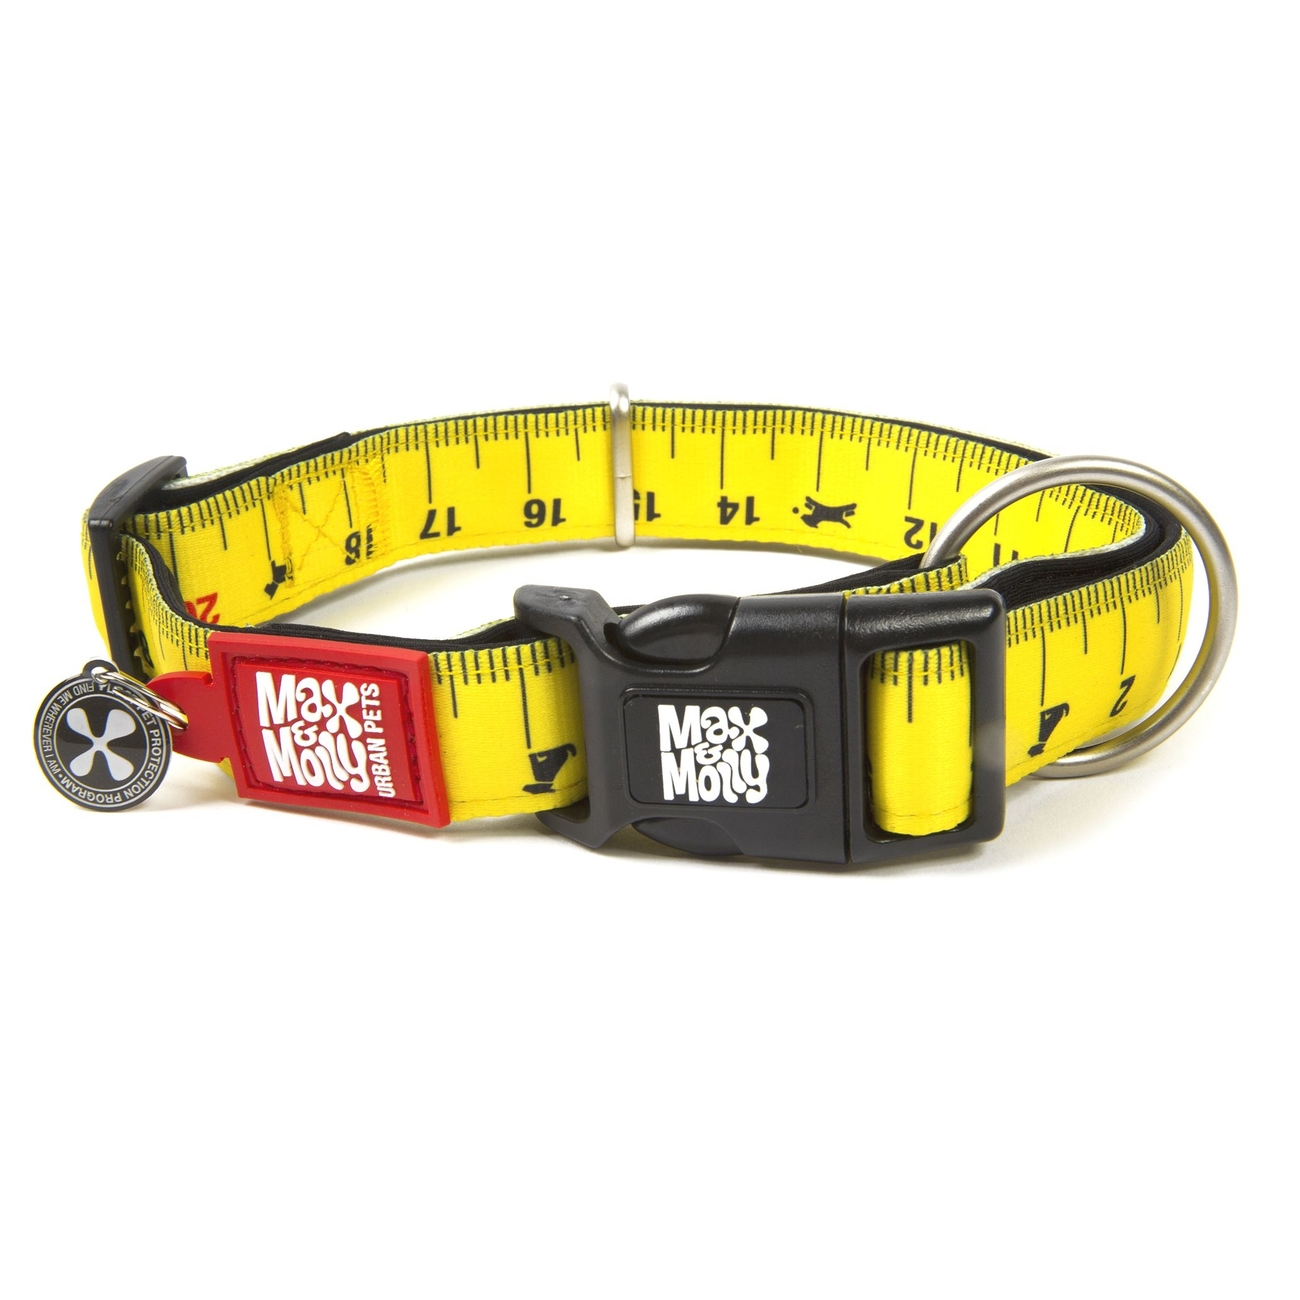 Max & Molly Smart ID Hundehalsband Ruler